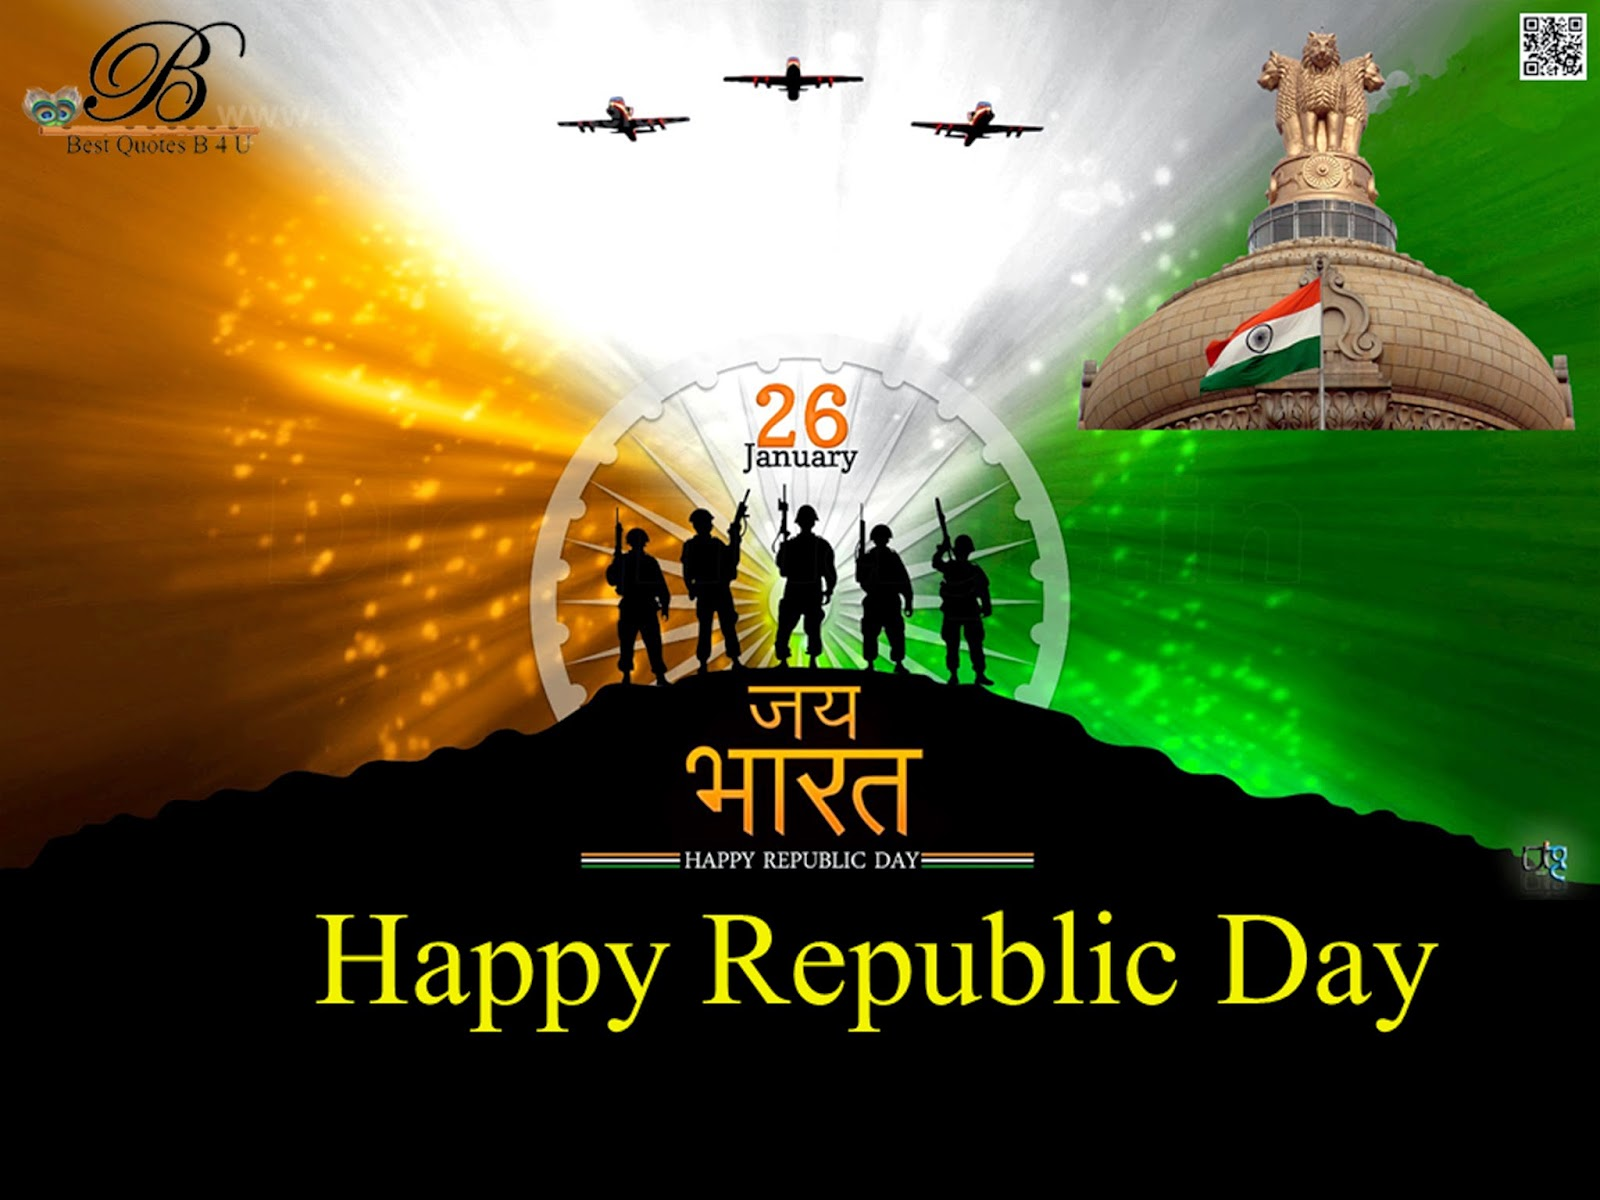 RepublicDay Quotes RepublicDay wishes RepublicDay HDwallpapers RepublicDay wishes